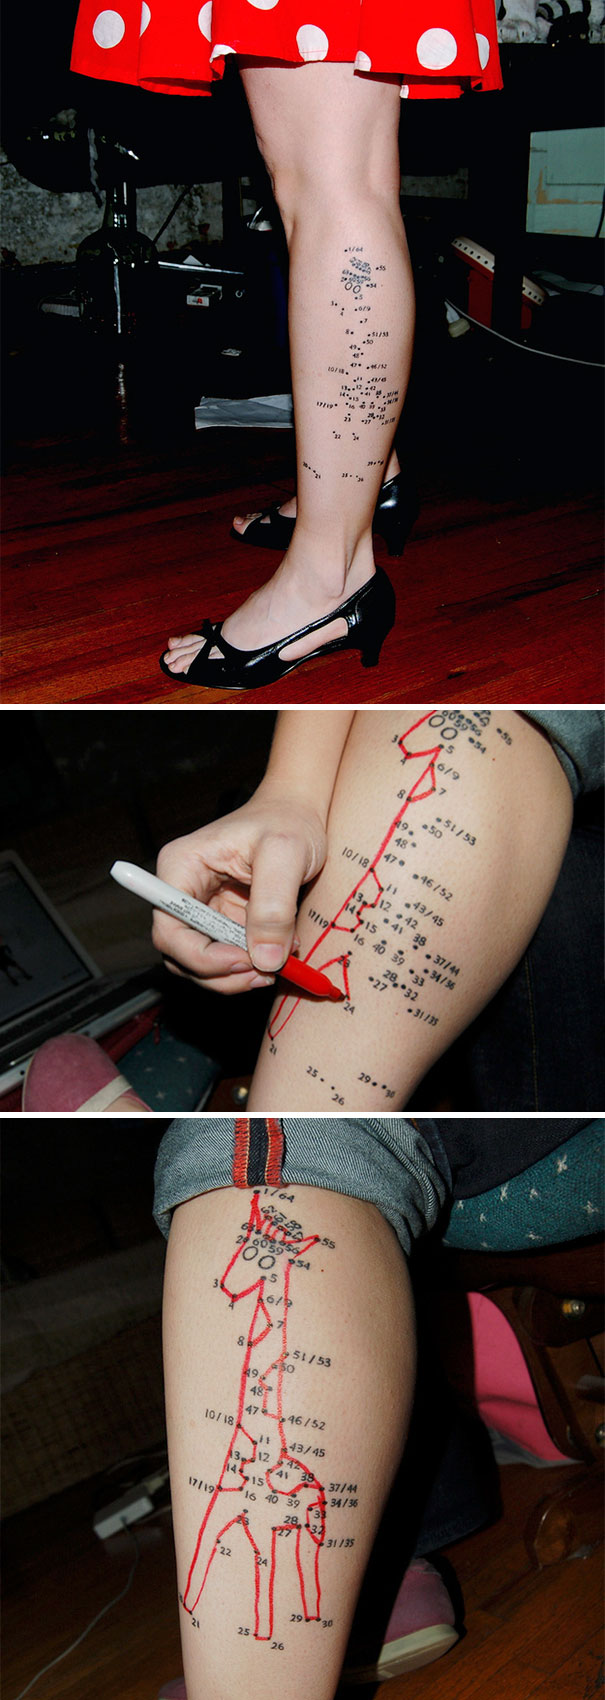 hidden-meaning-tattoos-6